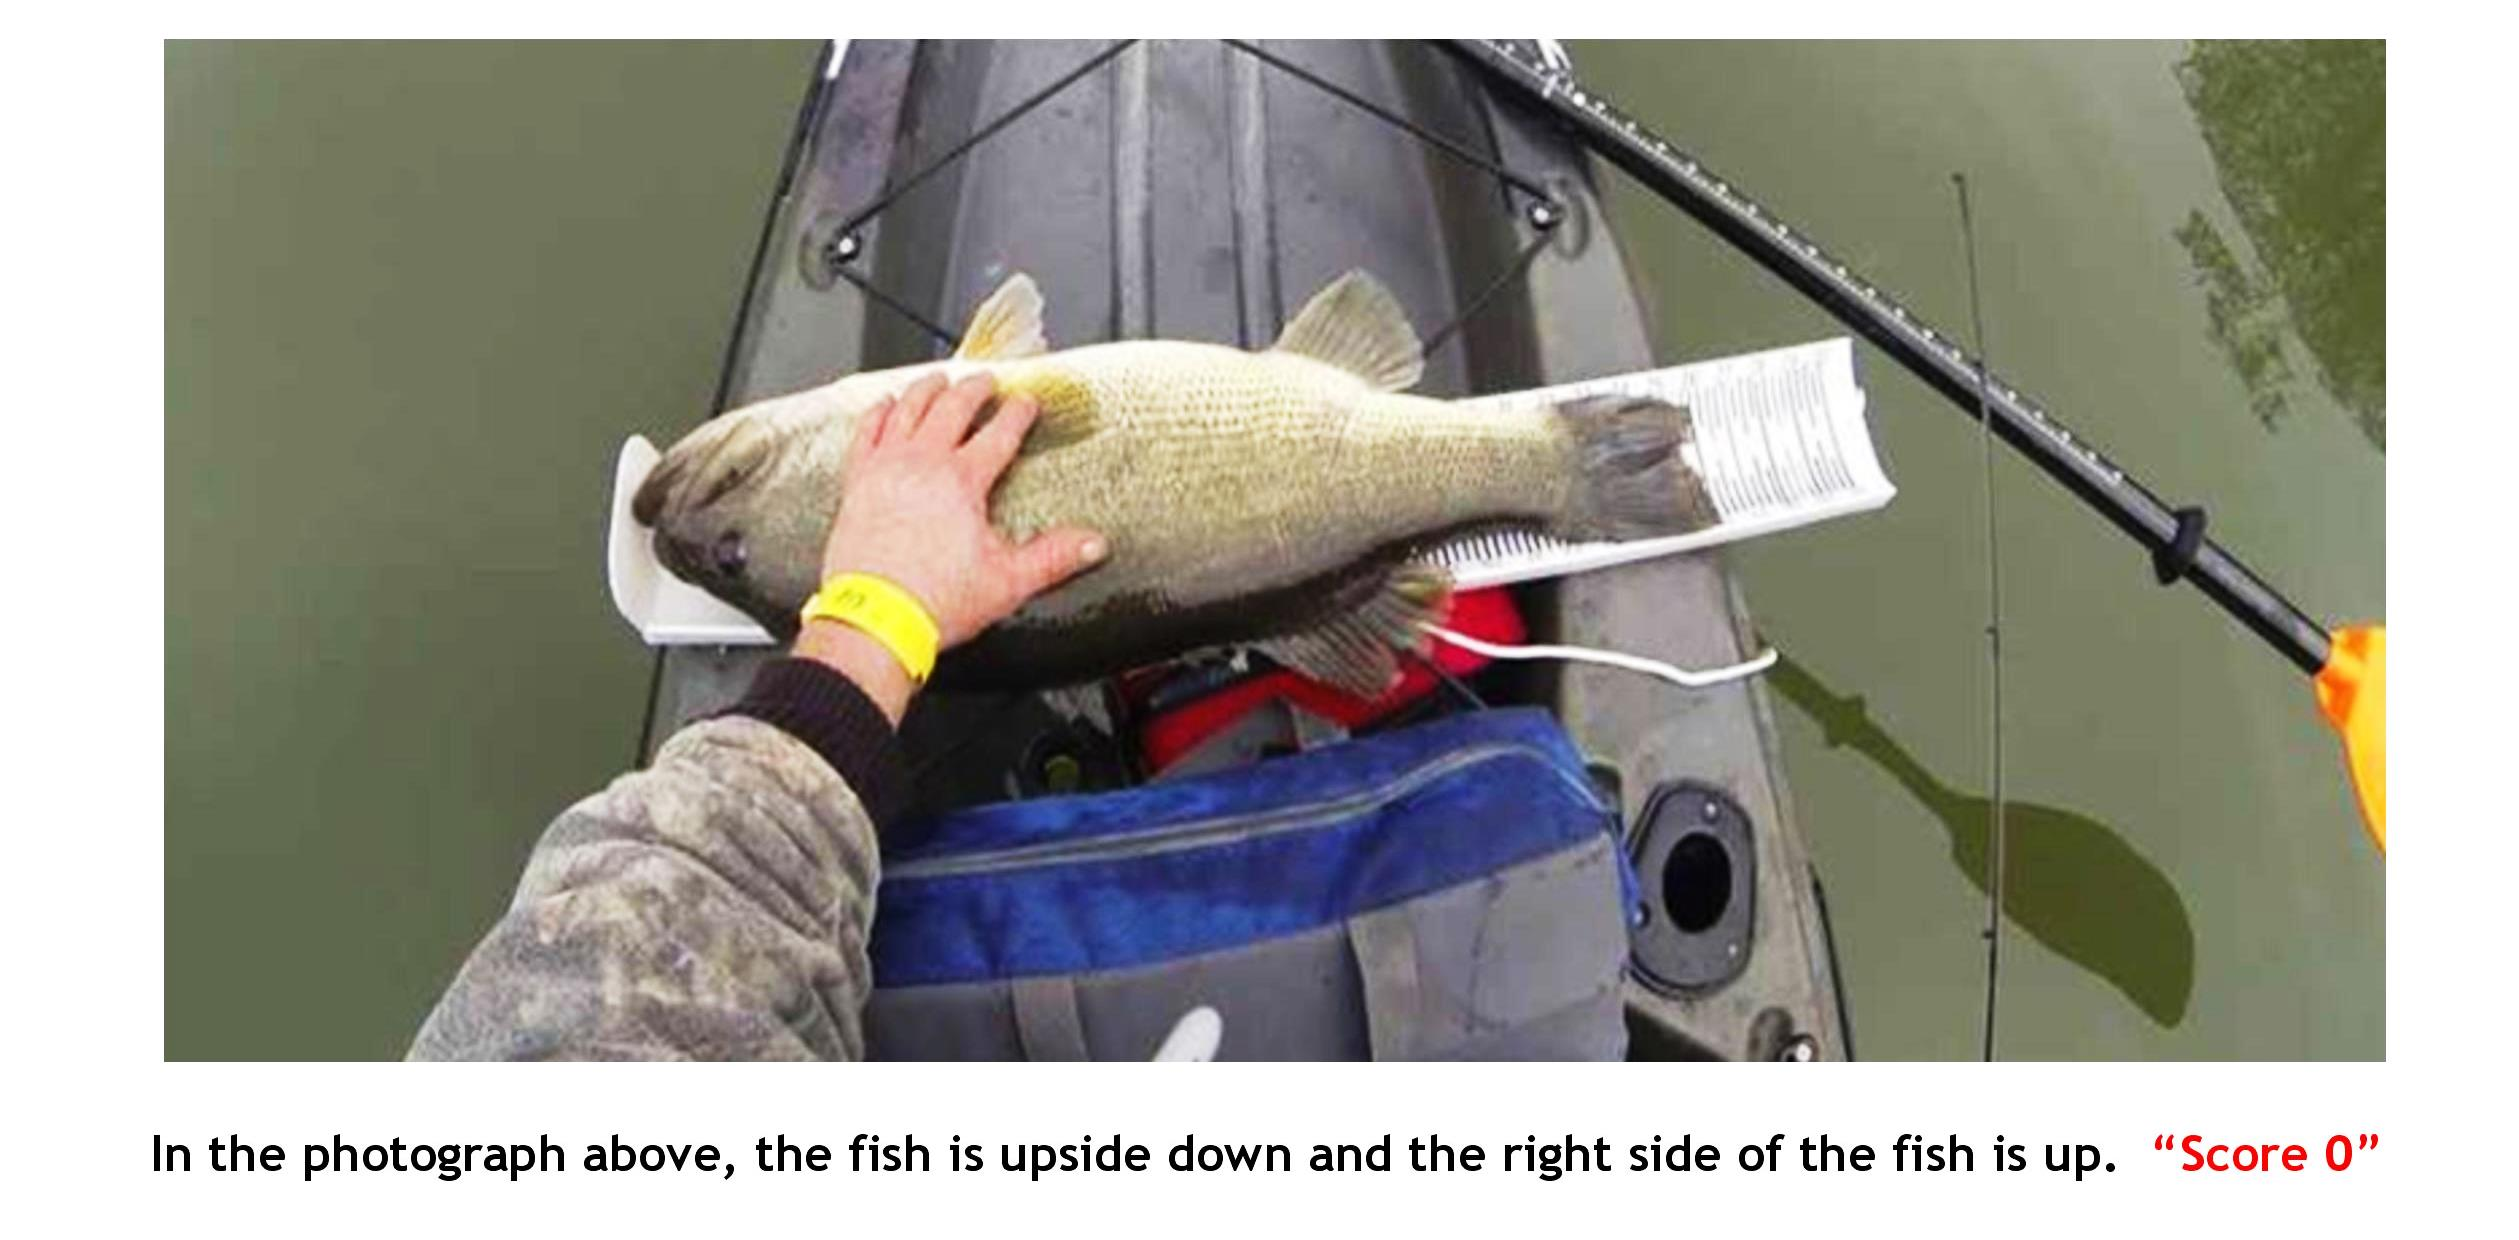 fish-5-upside-down